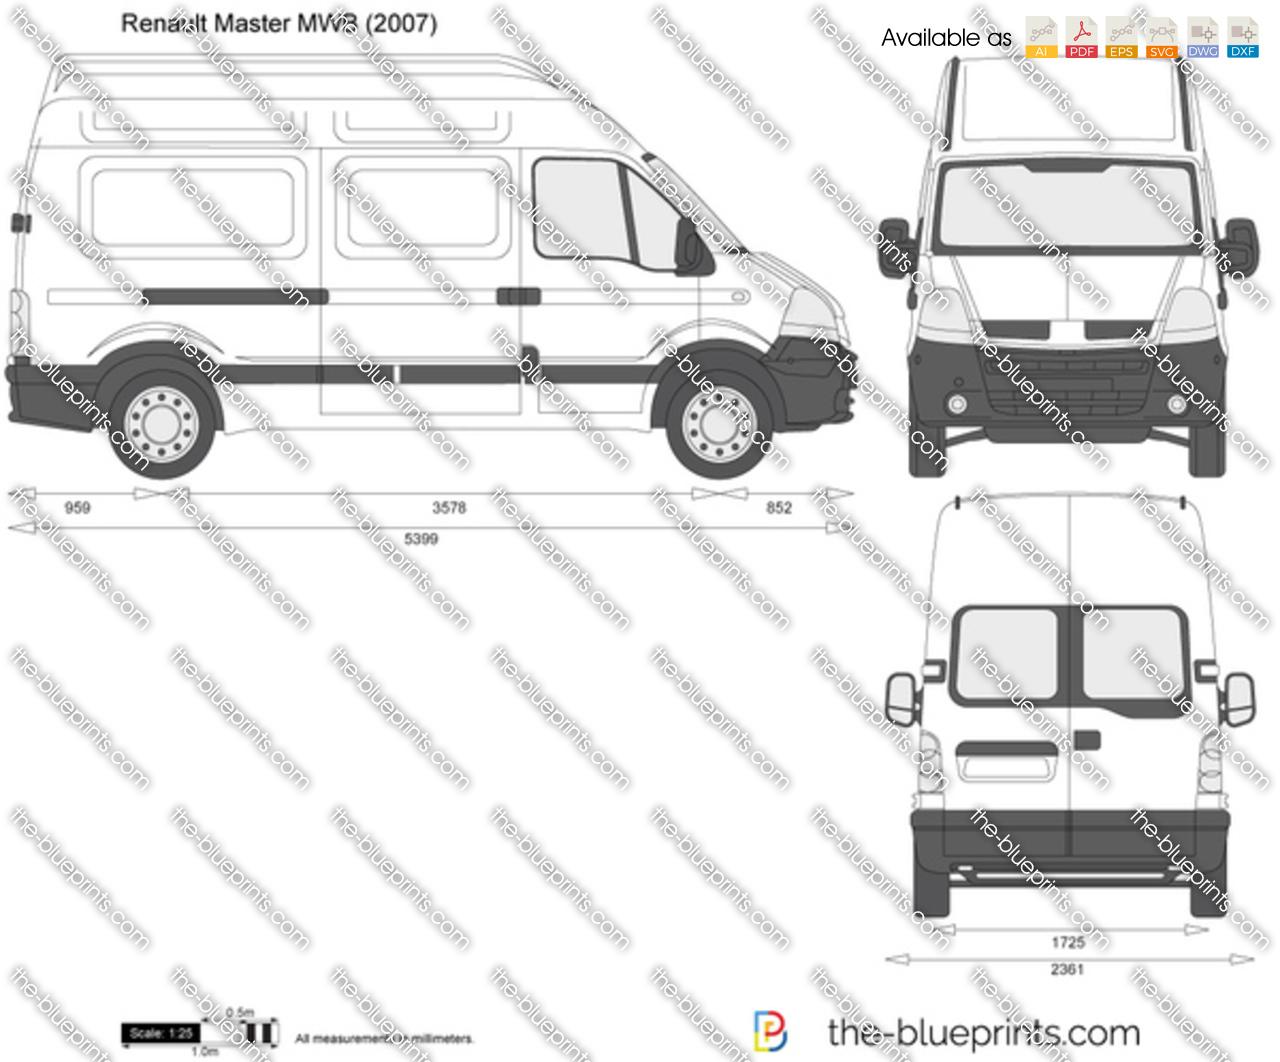 Renault Master Mwb Vector Drawing